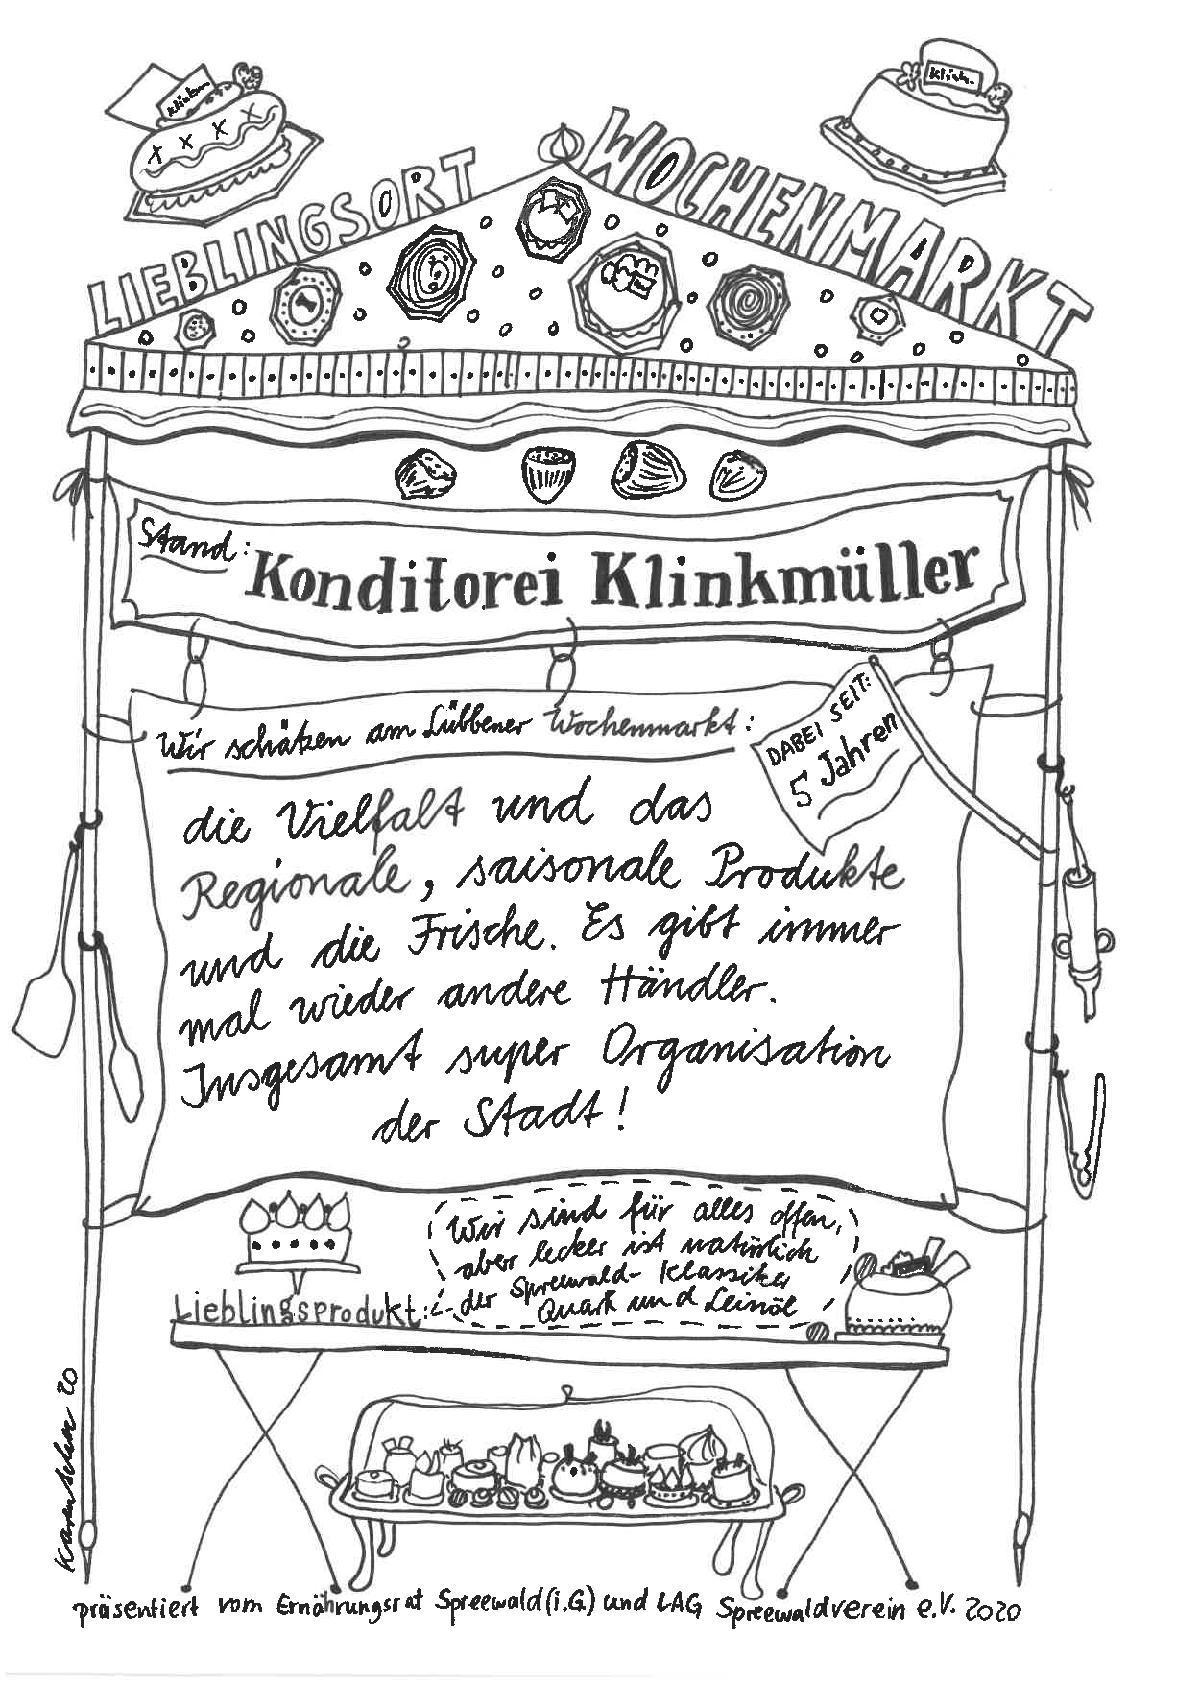 Konditorei Klinkmüller